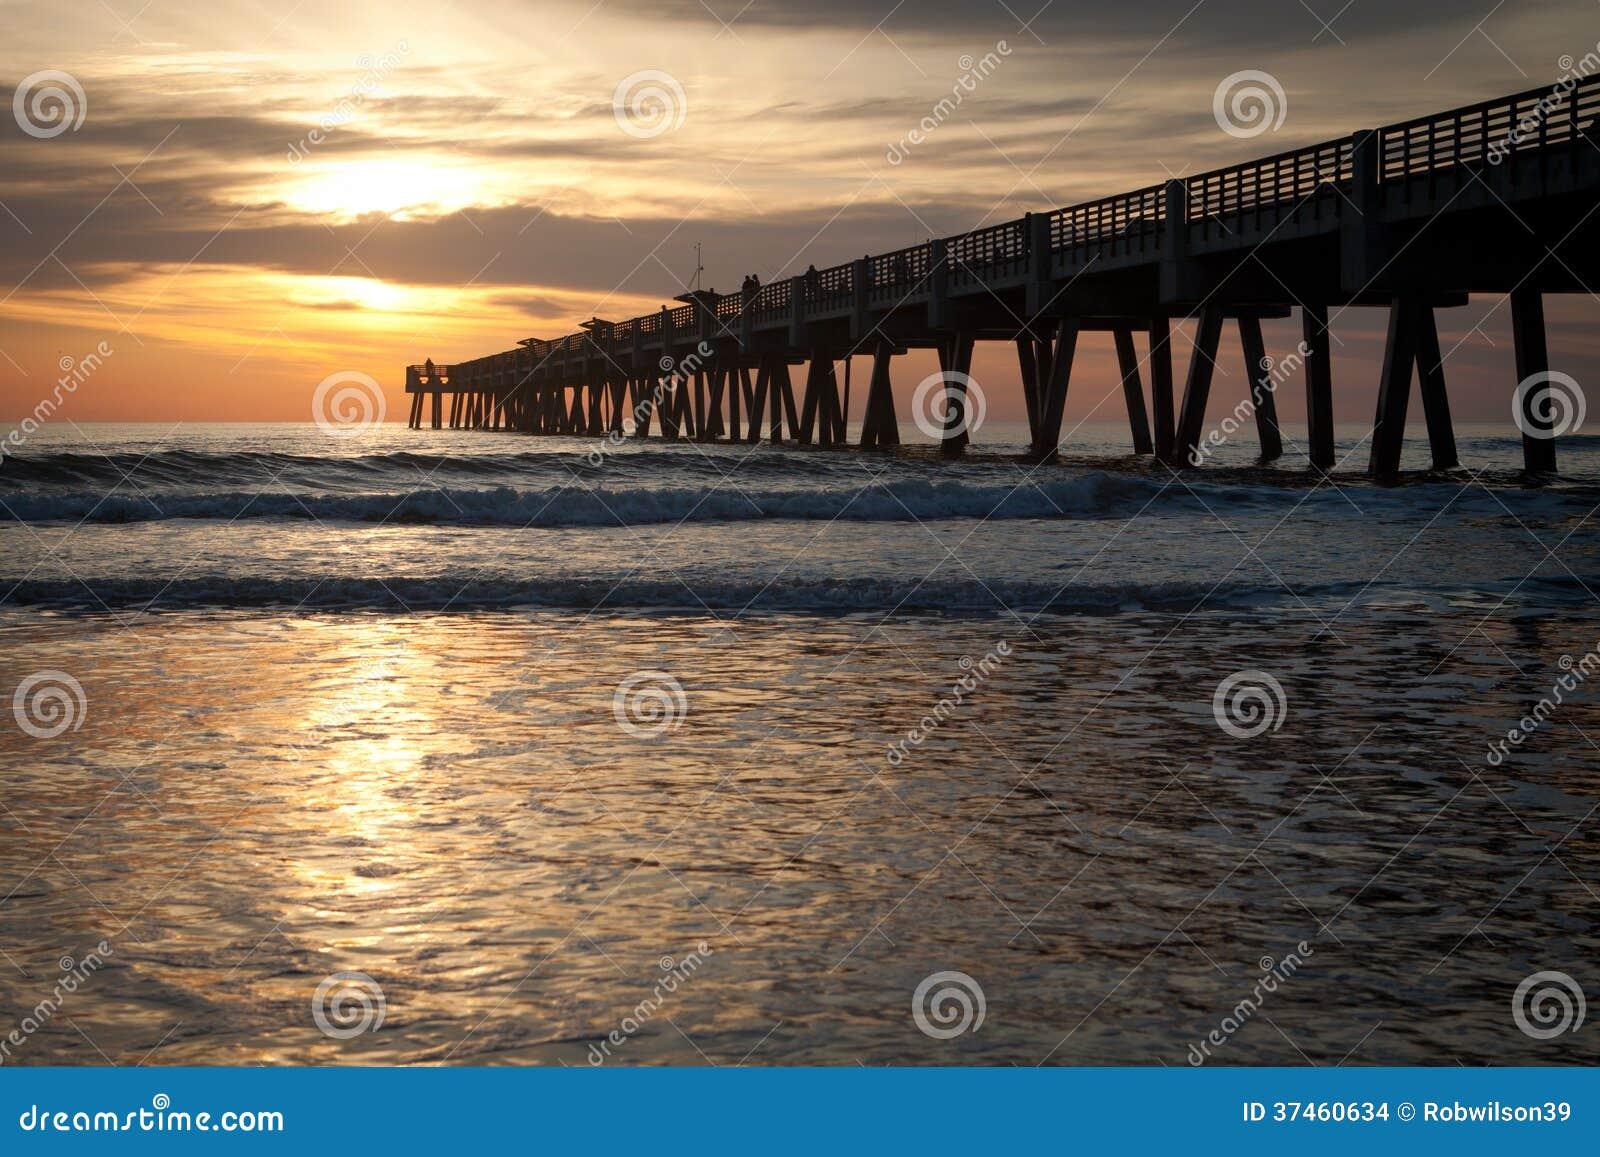 Fishing pier stock images image 37460634 for Jacksonville fishing pier